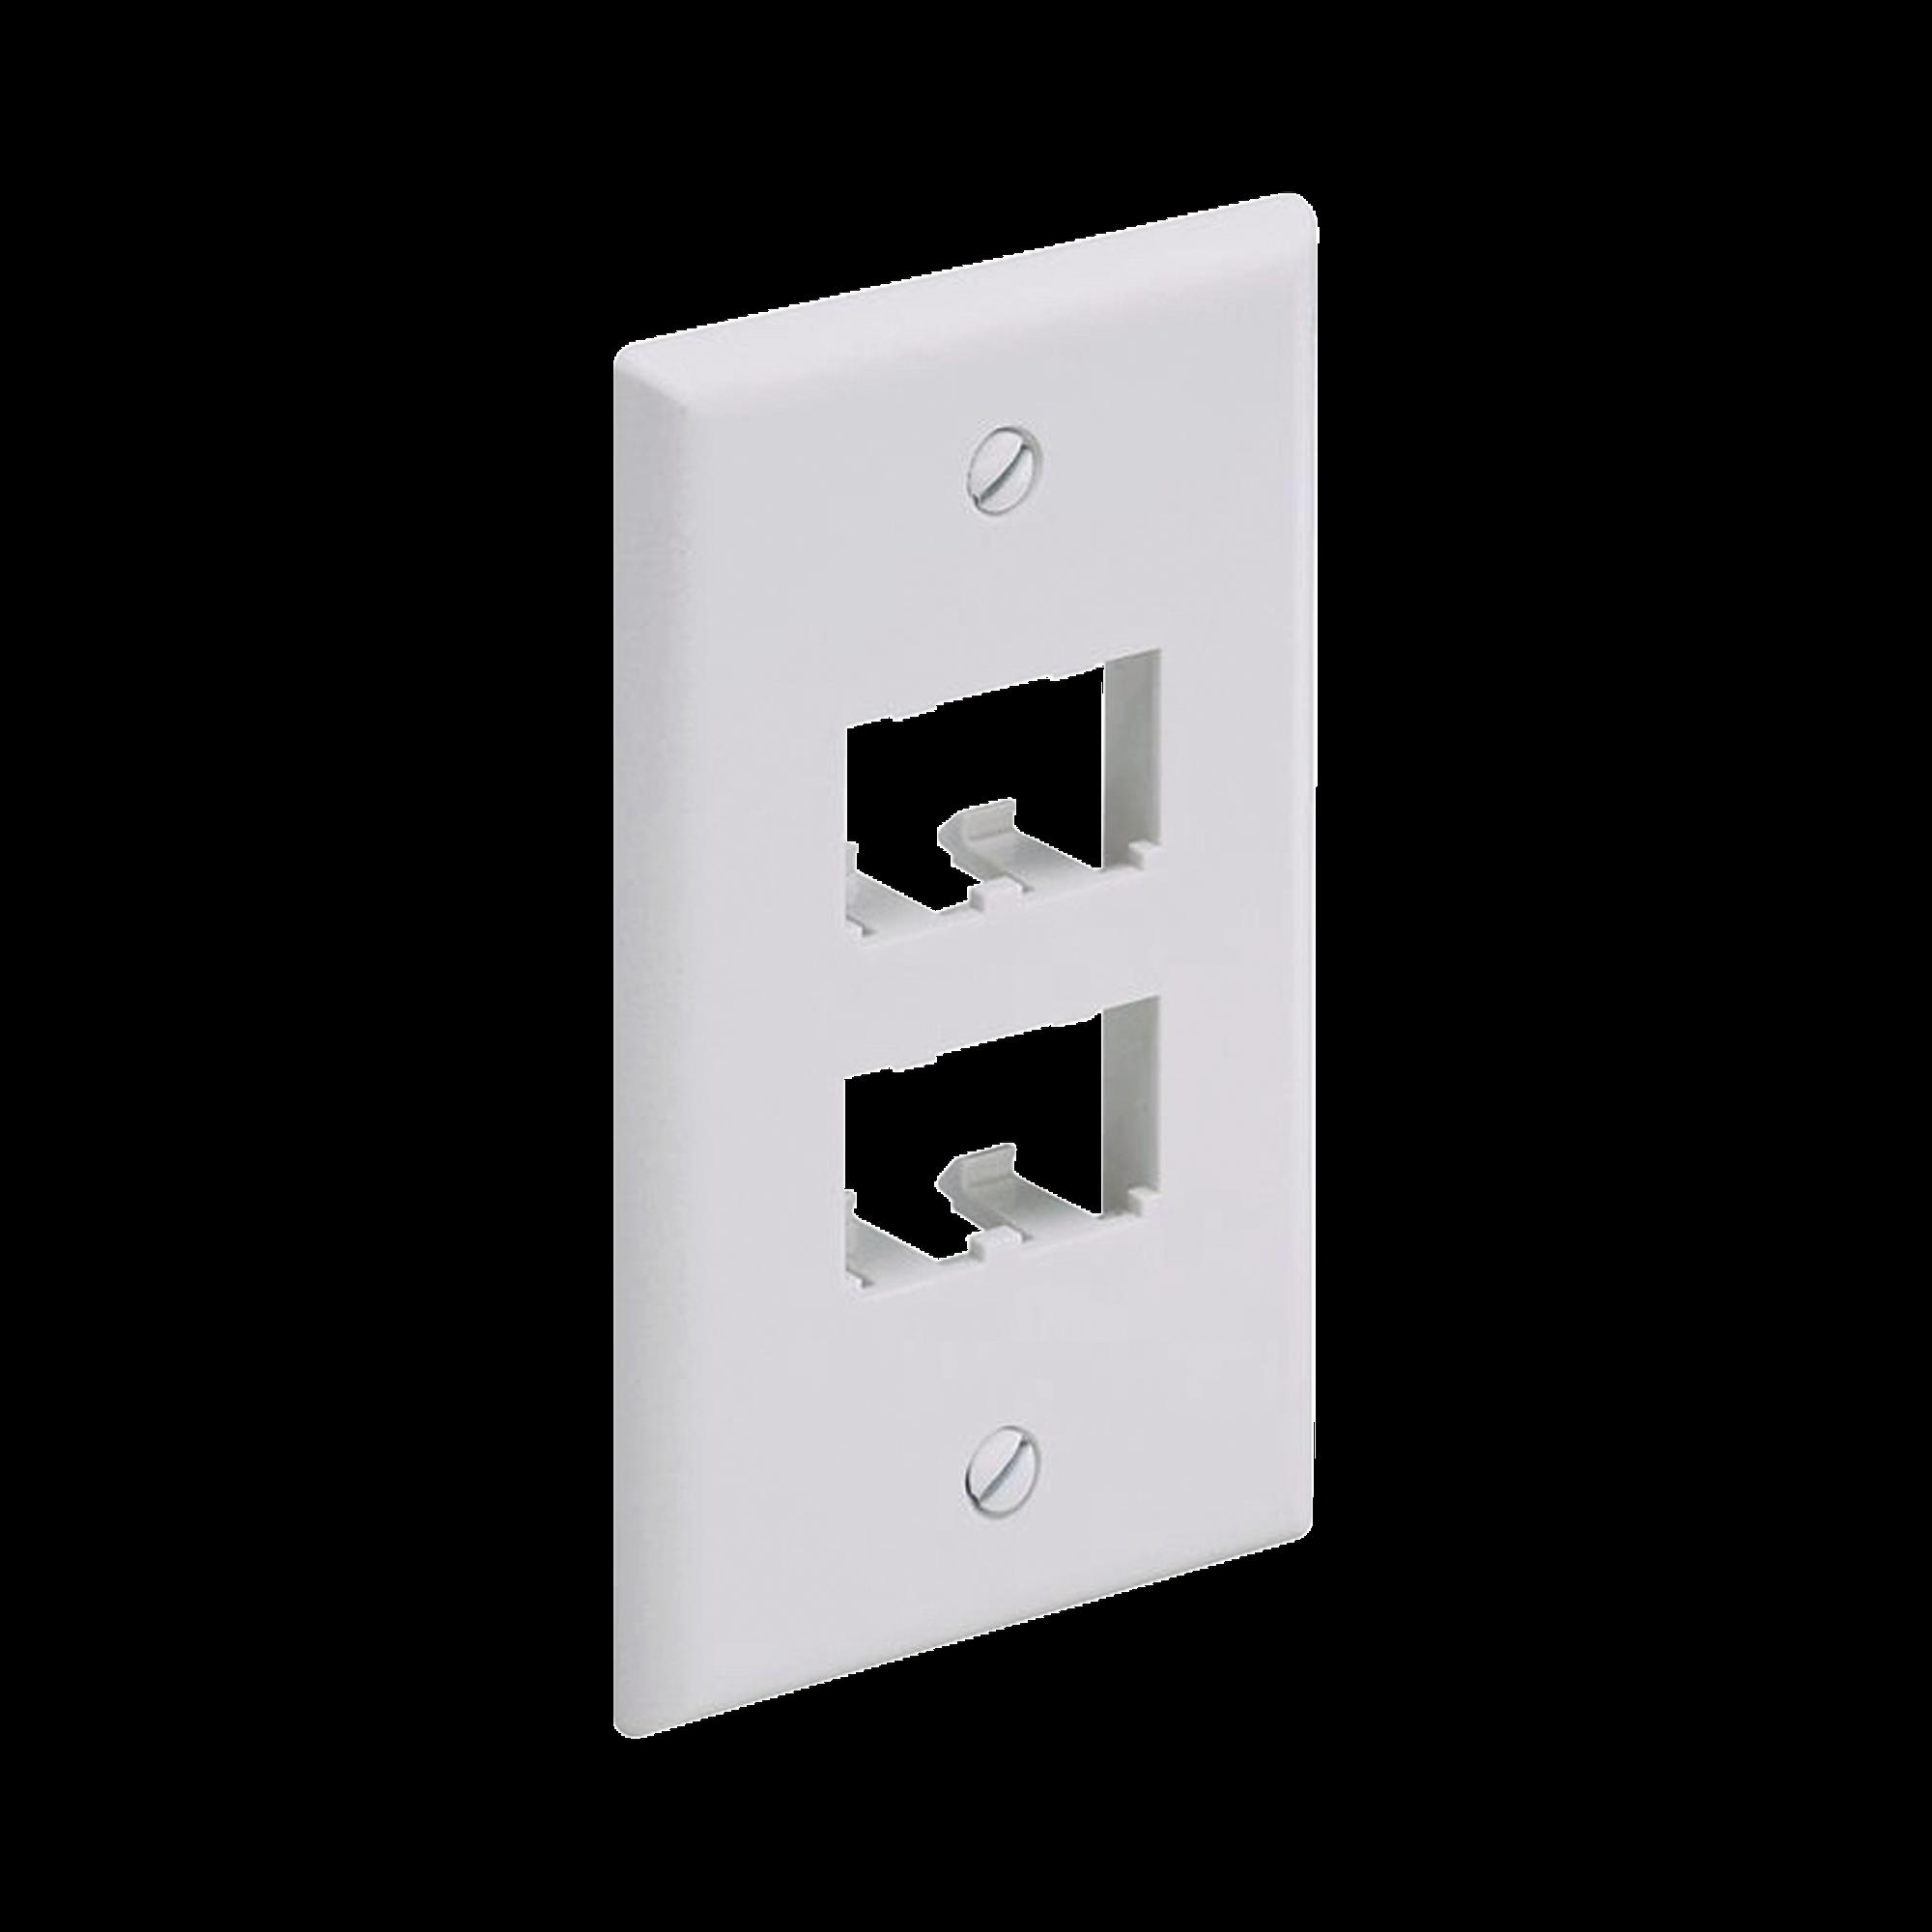 Placa de Pared Vertical Clásica, Salida Para 4 Puertos Mini-Com, Color Blanco Mate